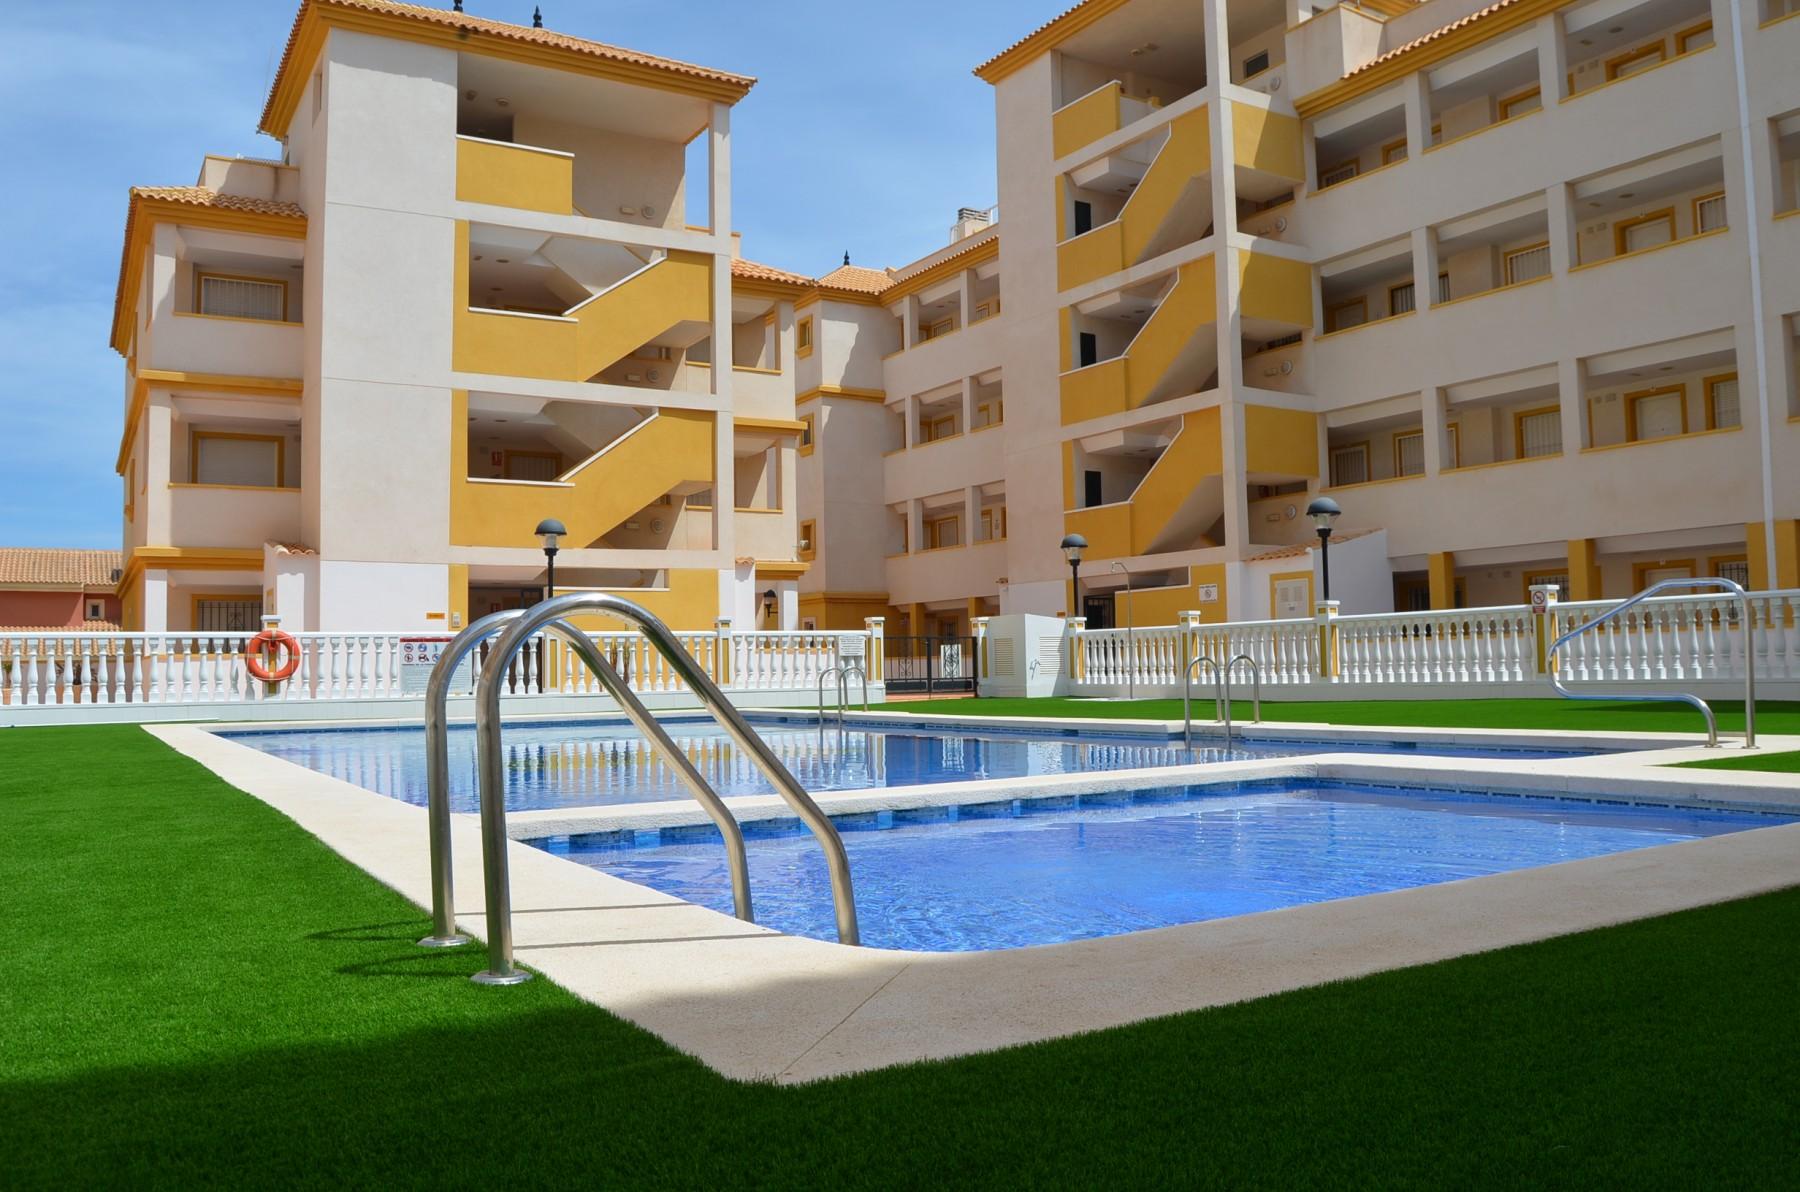 Penthouse Apartment Roof Terrace Sea View Communal Pool # Muebles Dous Murcia